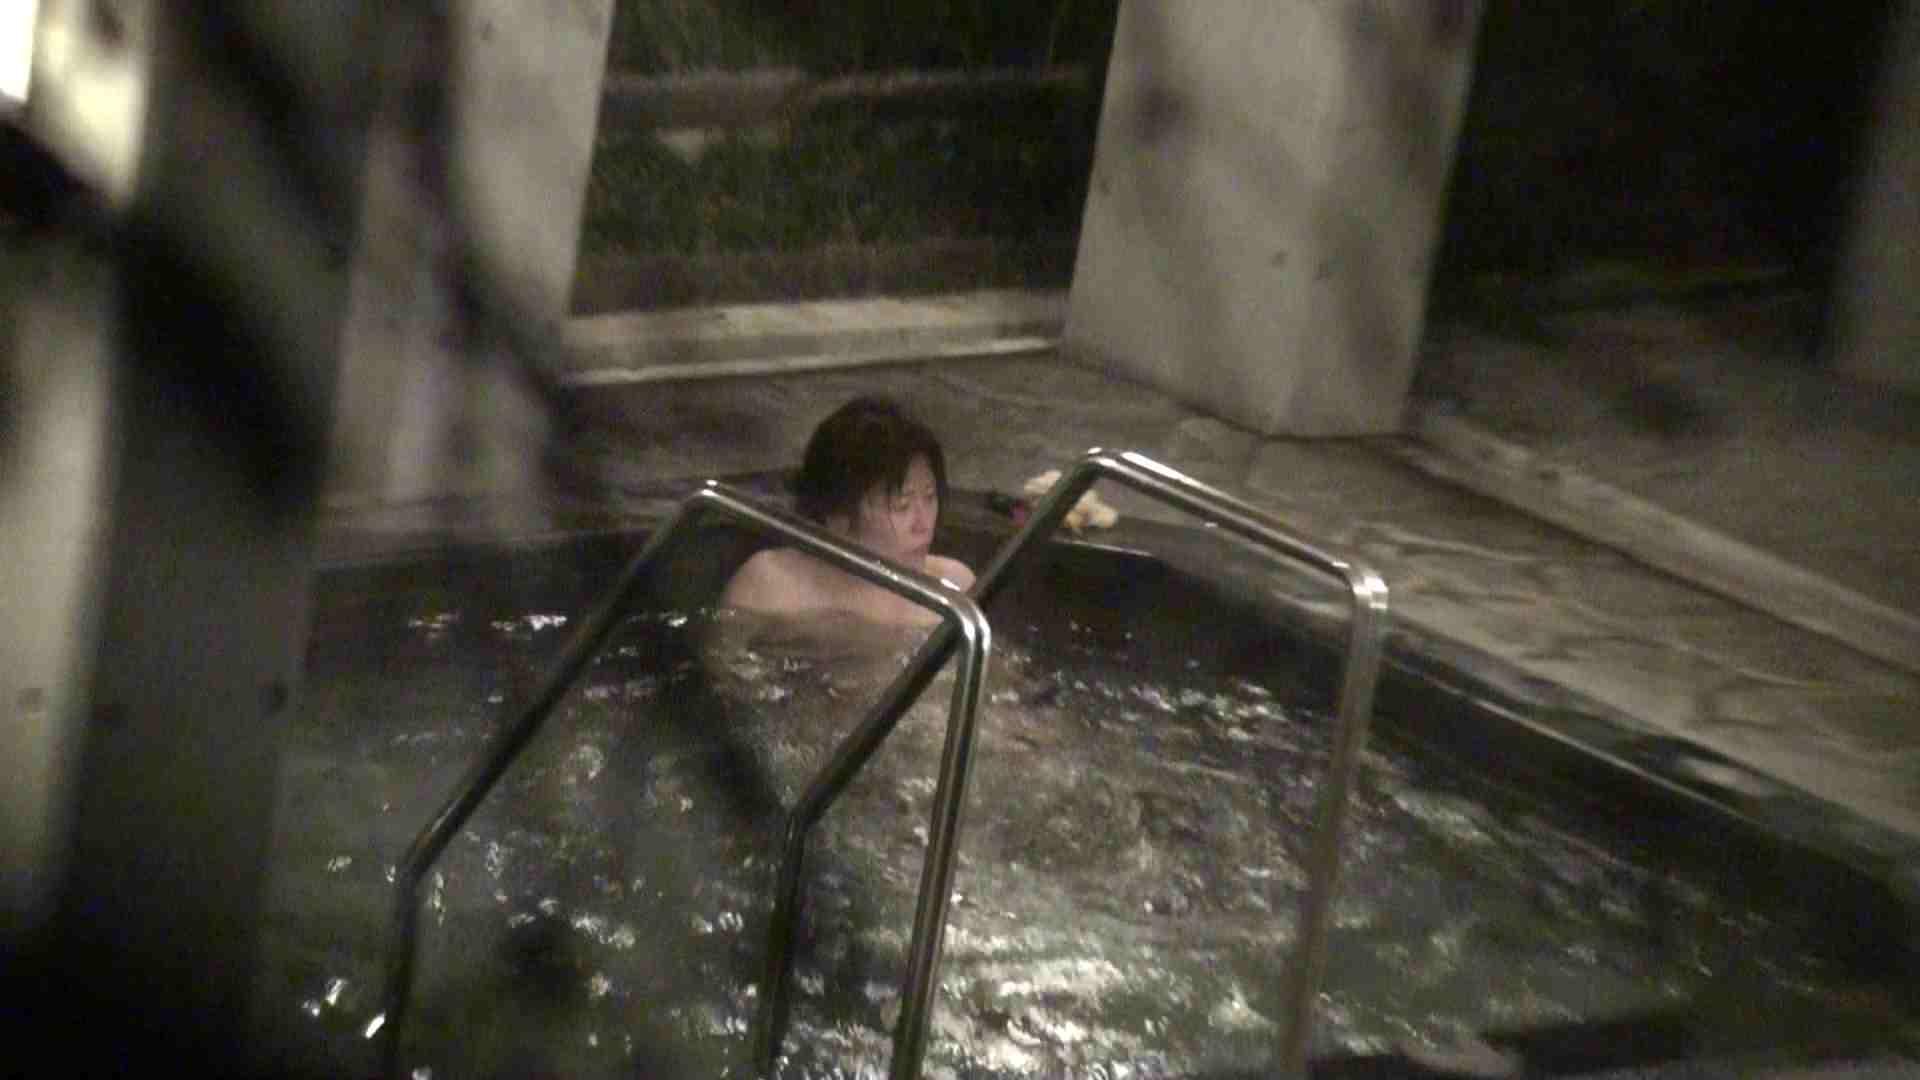 Aquaな露天風呂Vol.433 露天 | OLセックス  99画像 97